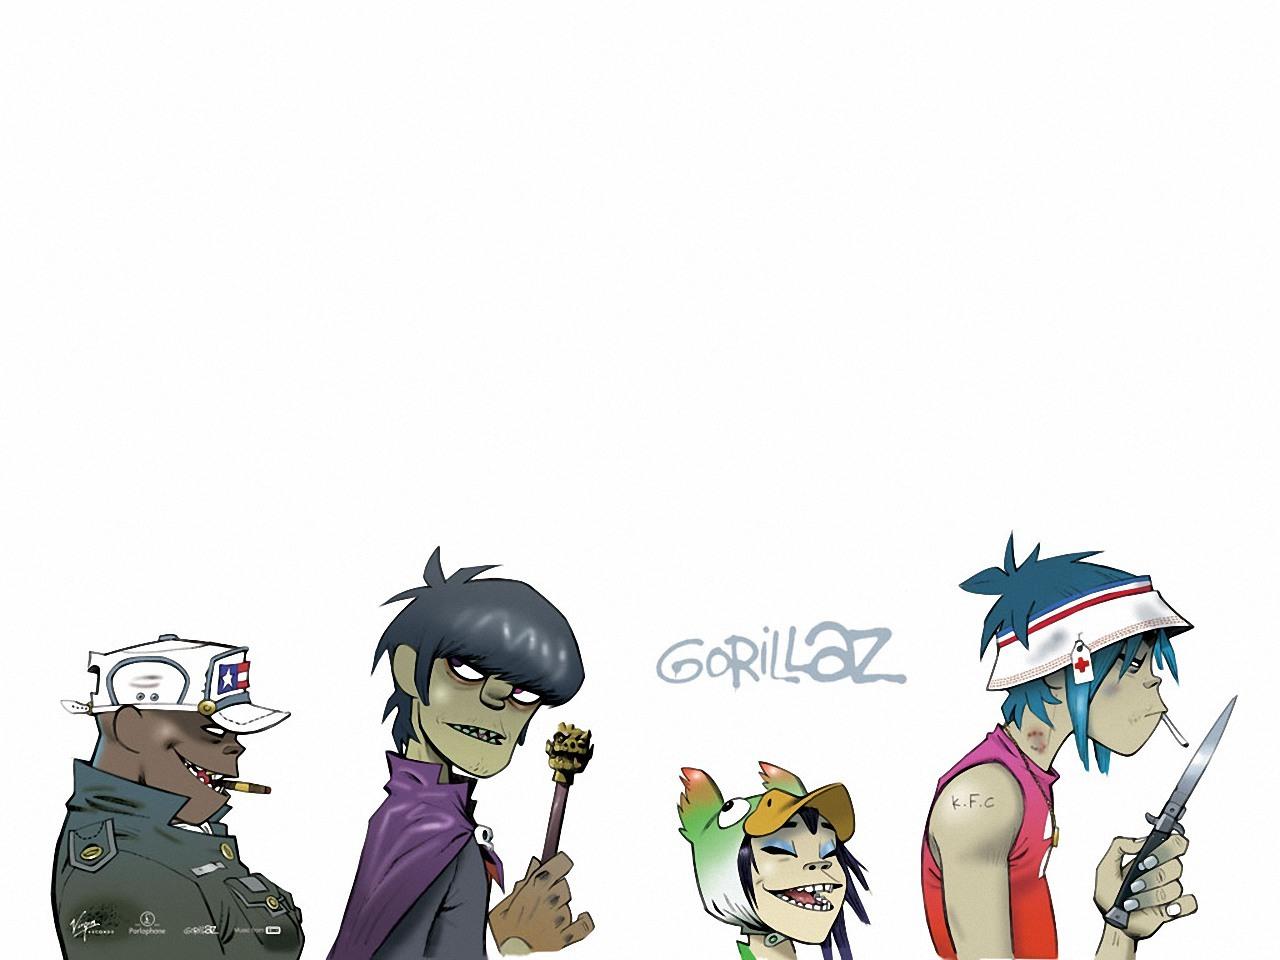 http://nelena-rockgod.blogspot.com/2014/02/gorillaz-wallpapers.html